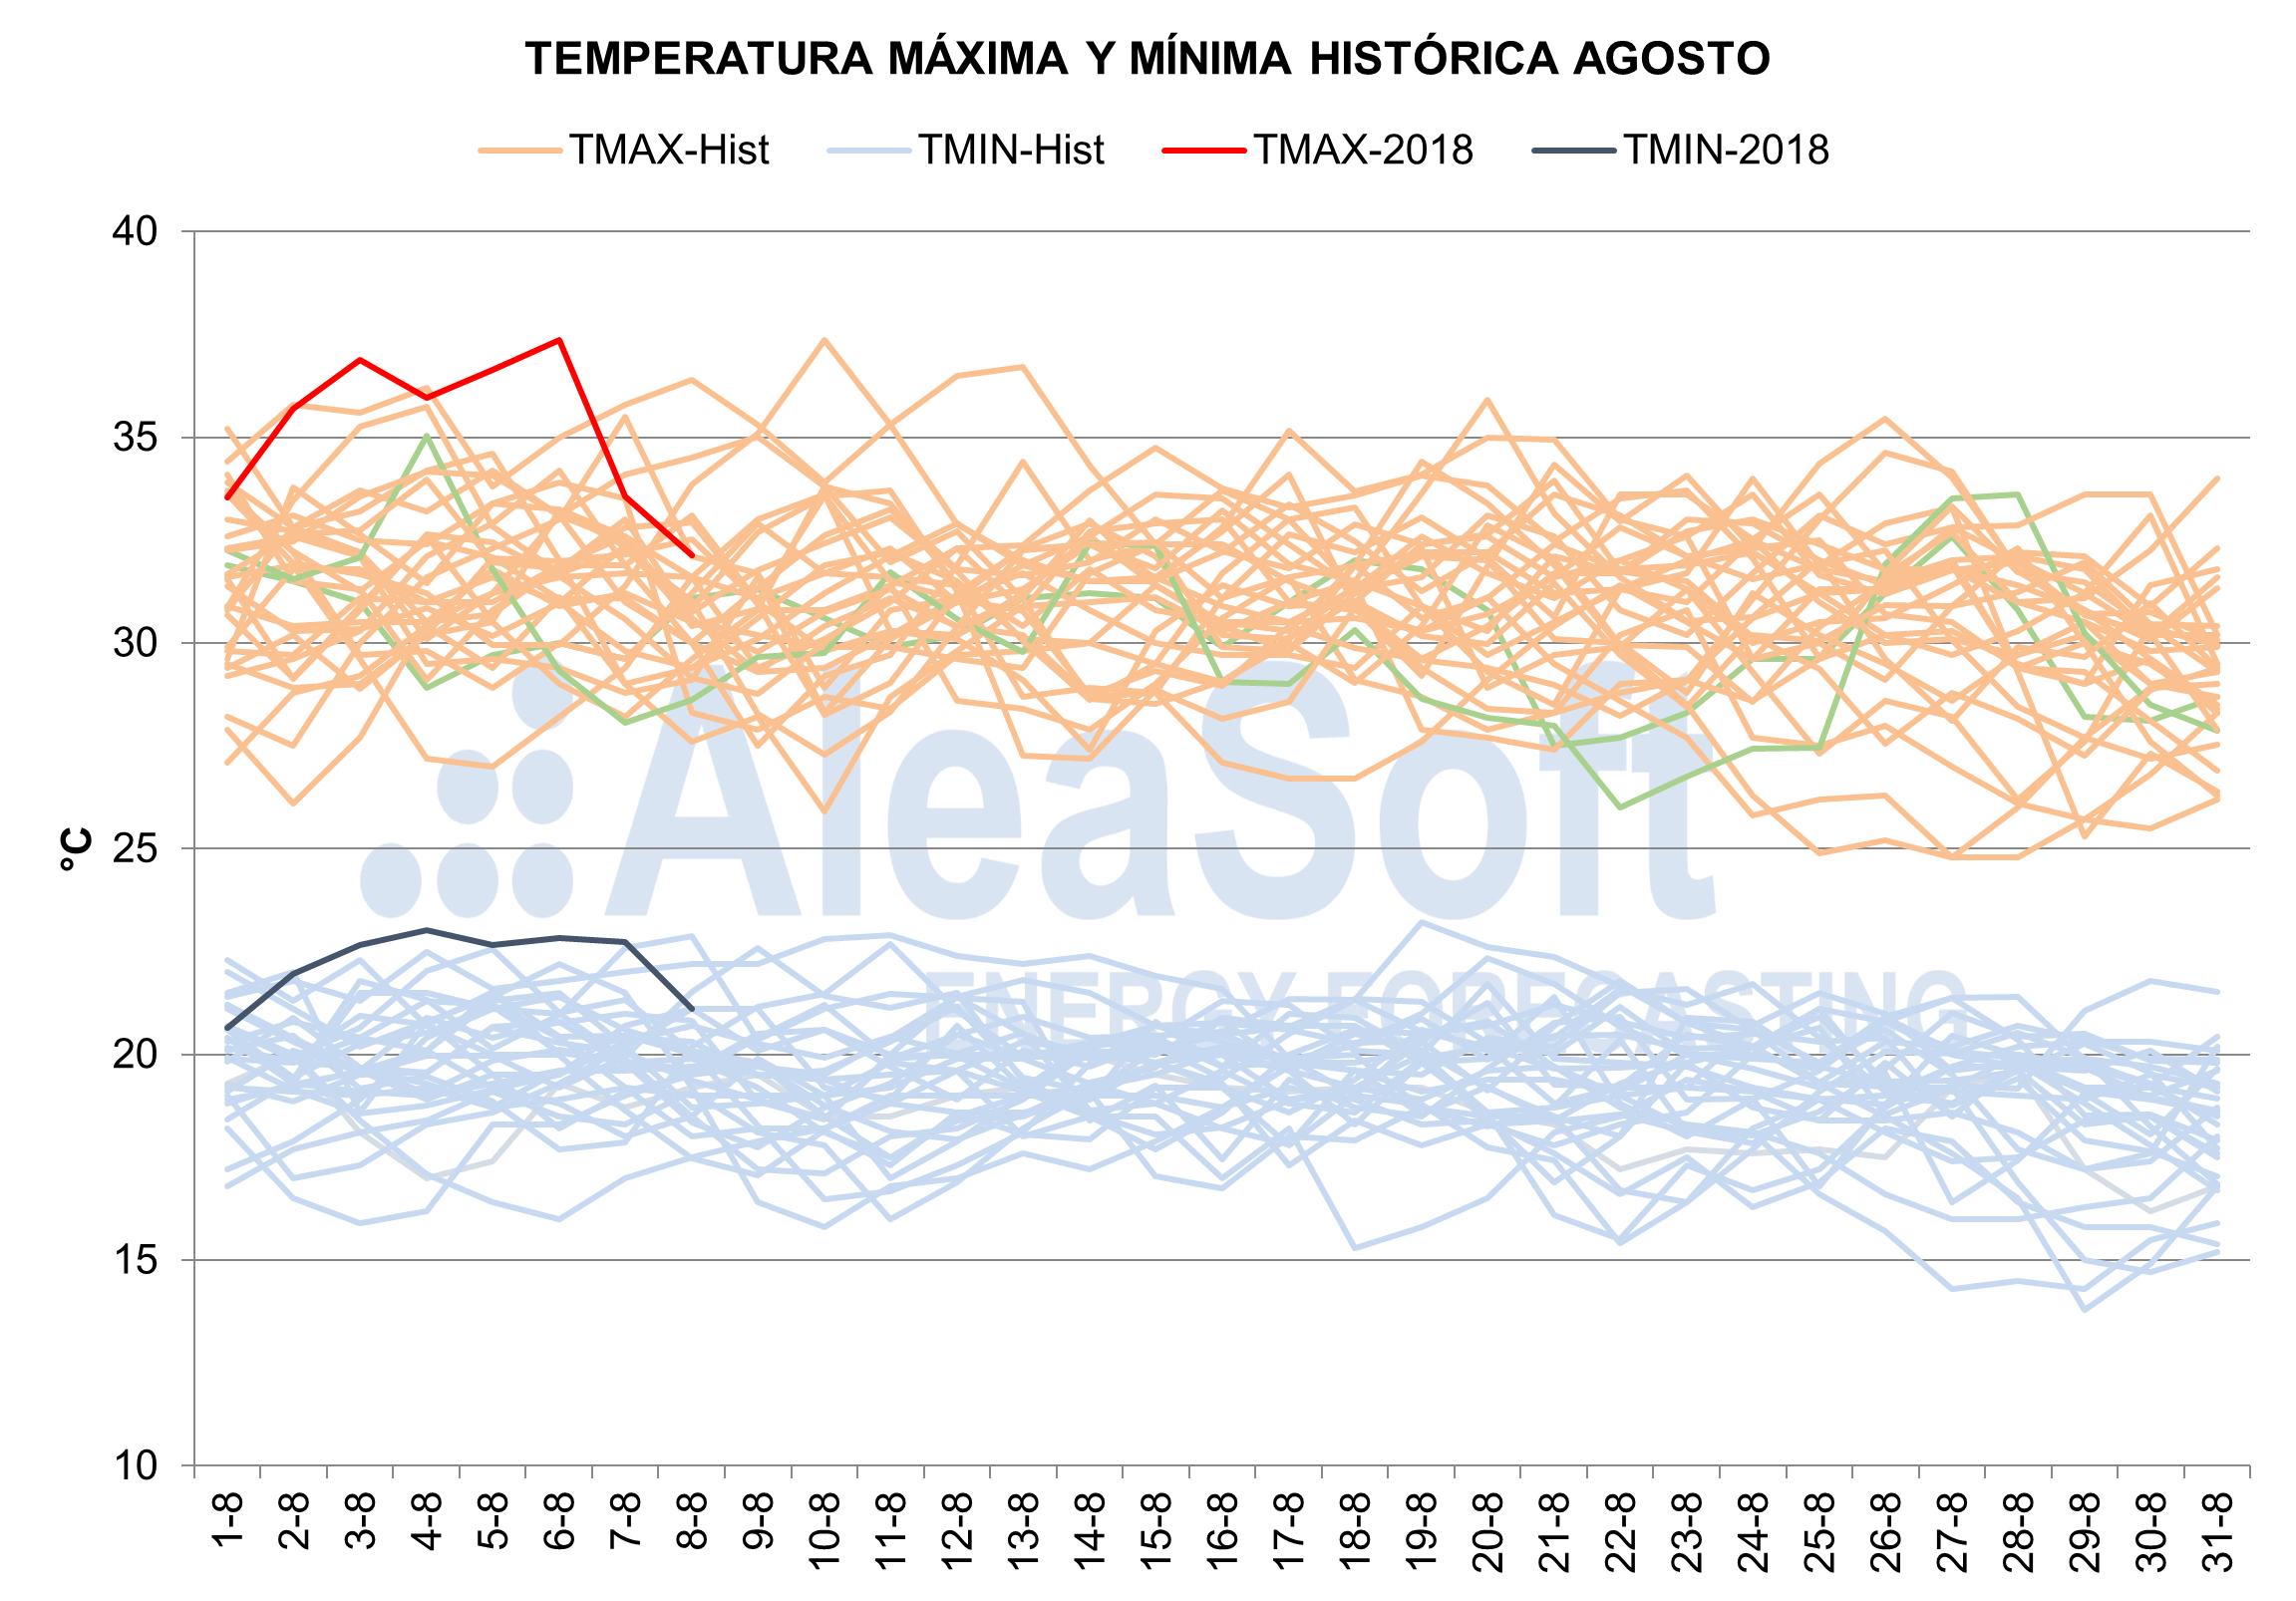 AleaSoft - Temperaturas históricas de Agosto